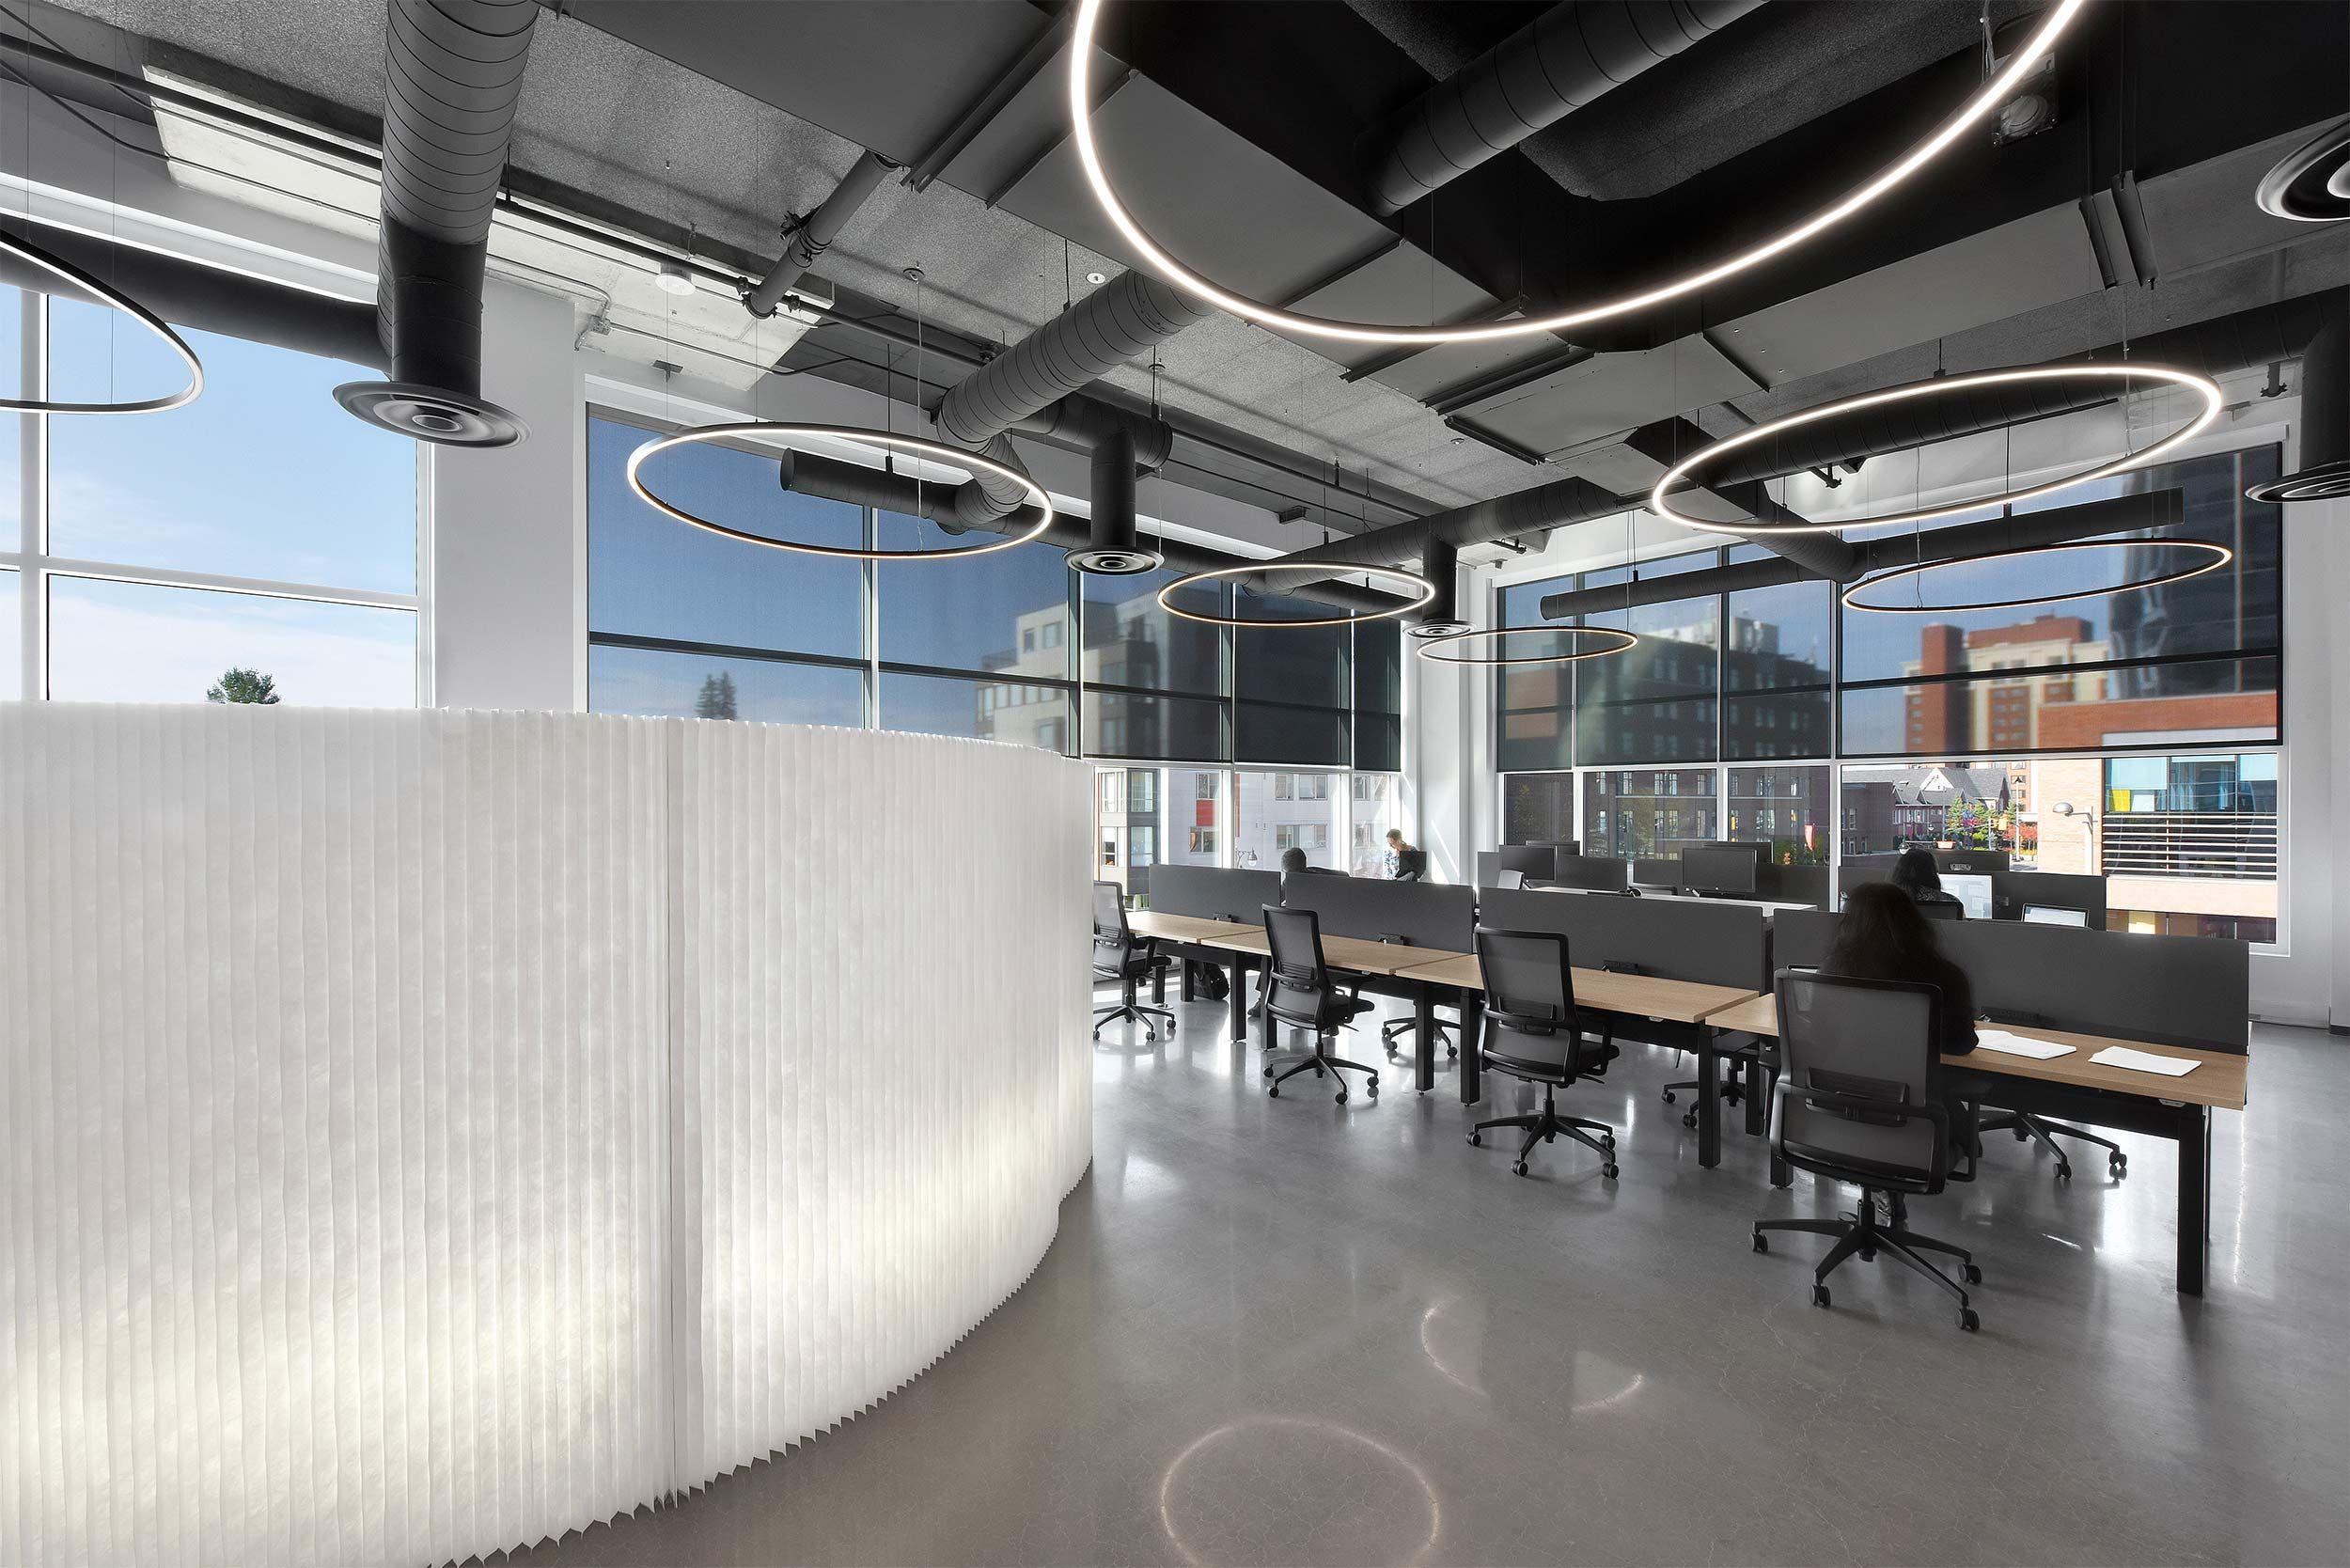 architects office design. Chmiel Architects, Office Lighting, Design, Interior Architecture, Modern, Architects Design E